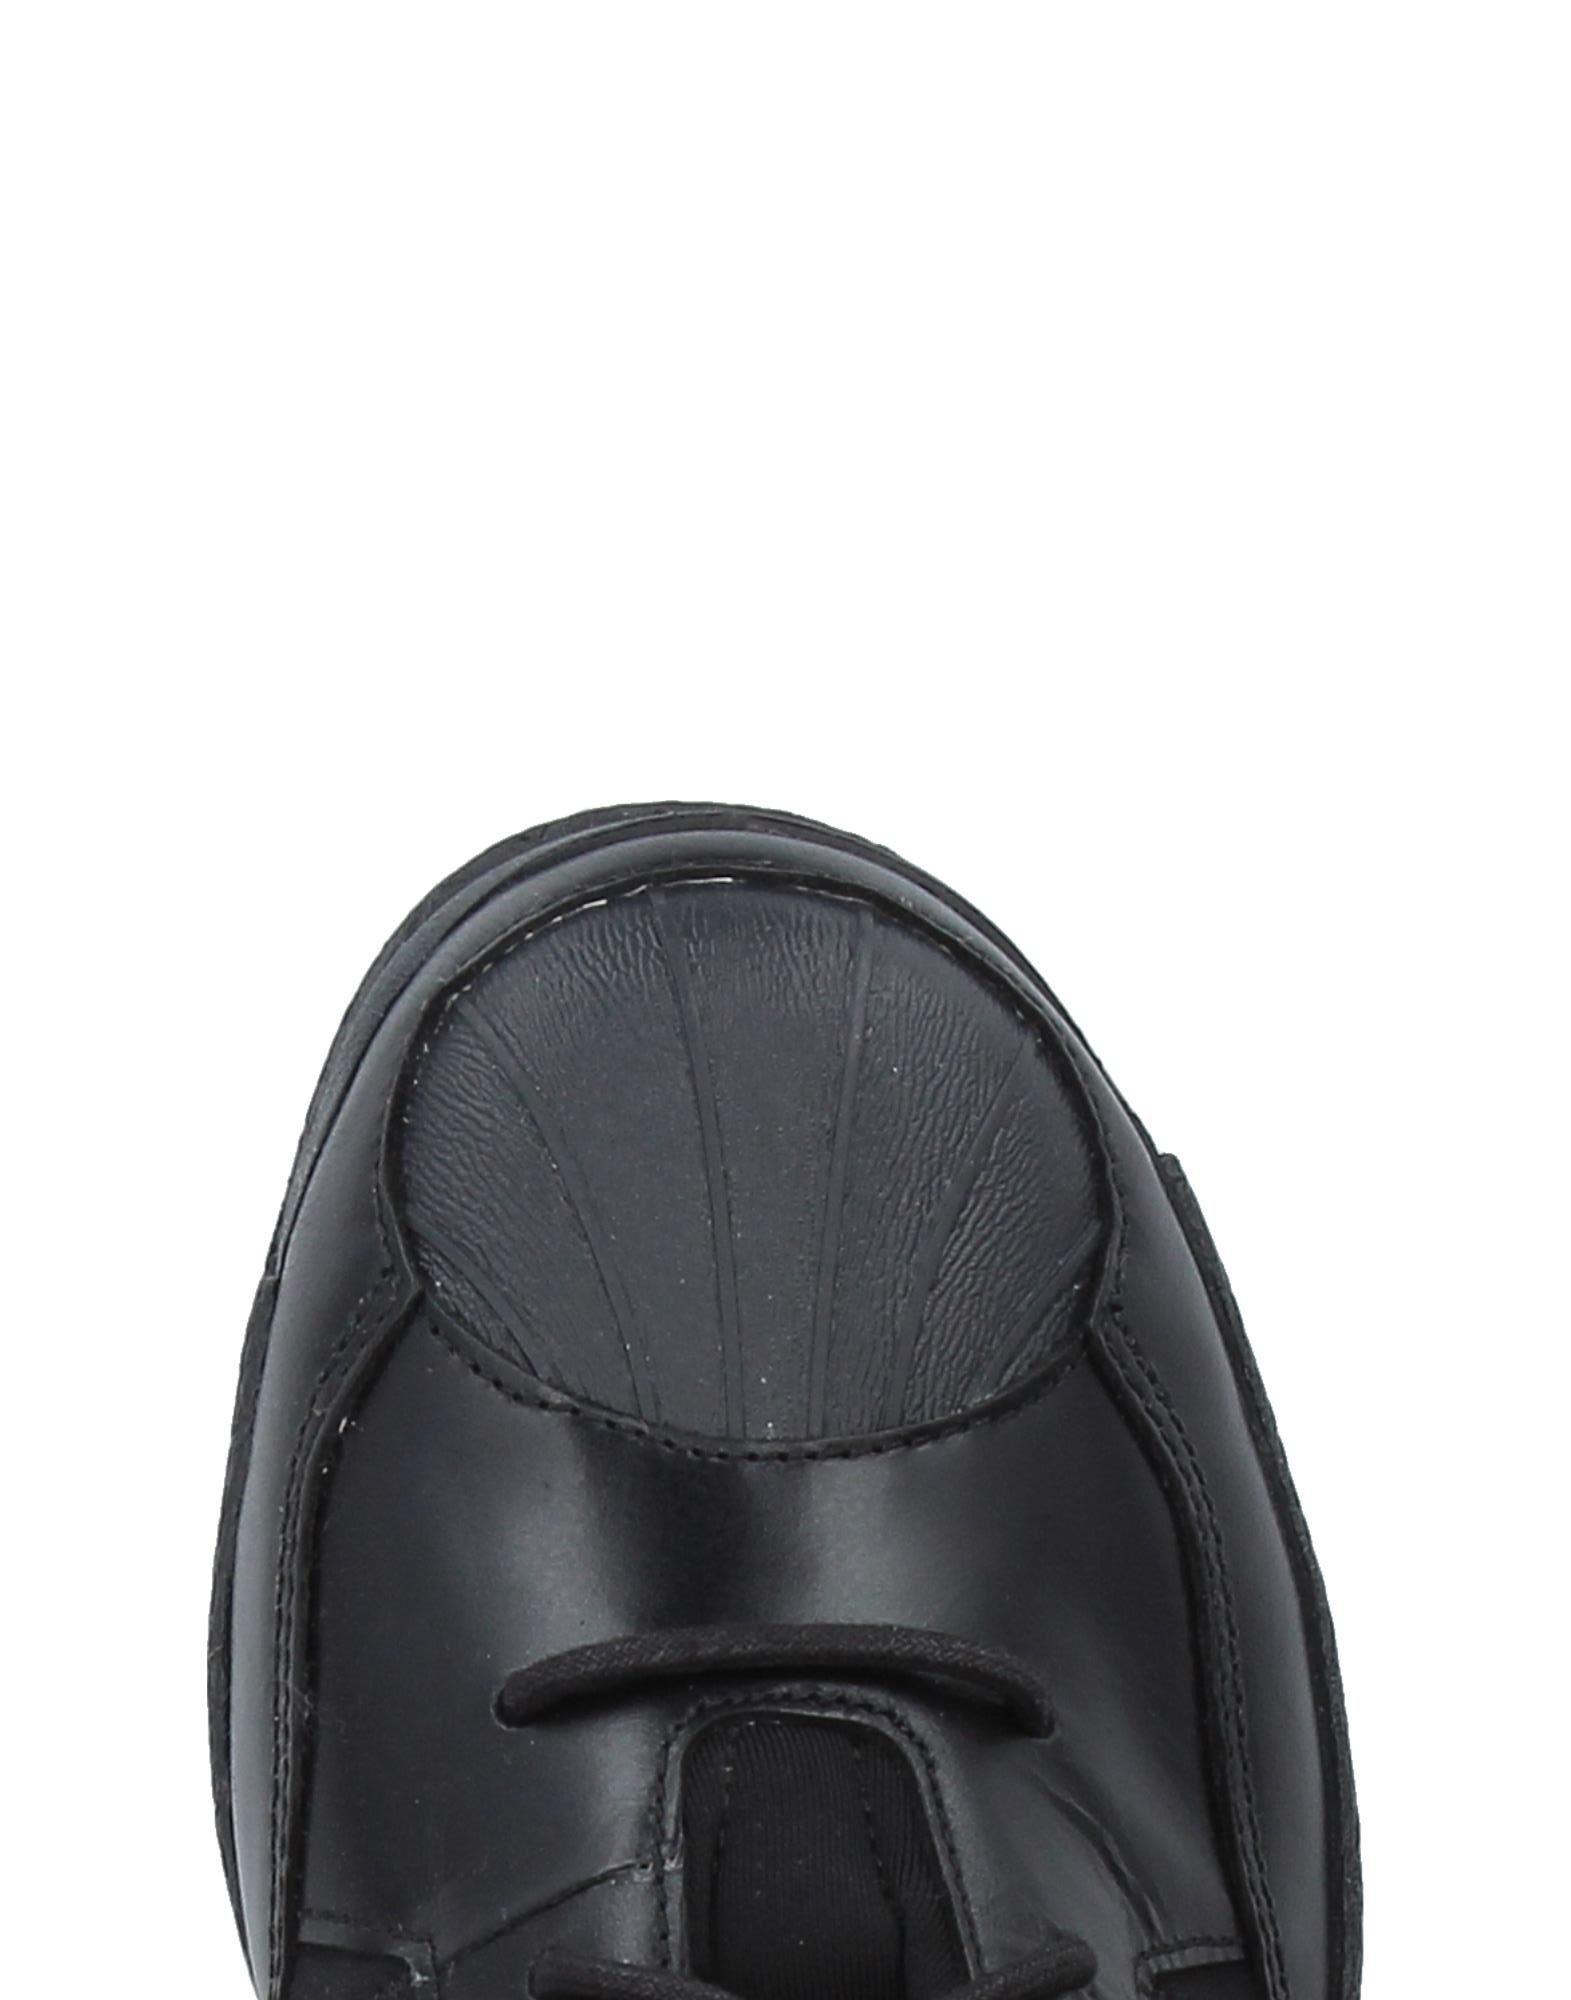 Adidas By Yohji Yamamoto Sneakers Herren  11371759EJ 11371759EJ 11371759EJ Heiße Schuhe 5dabf4